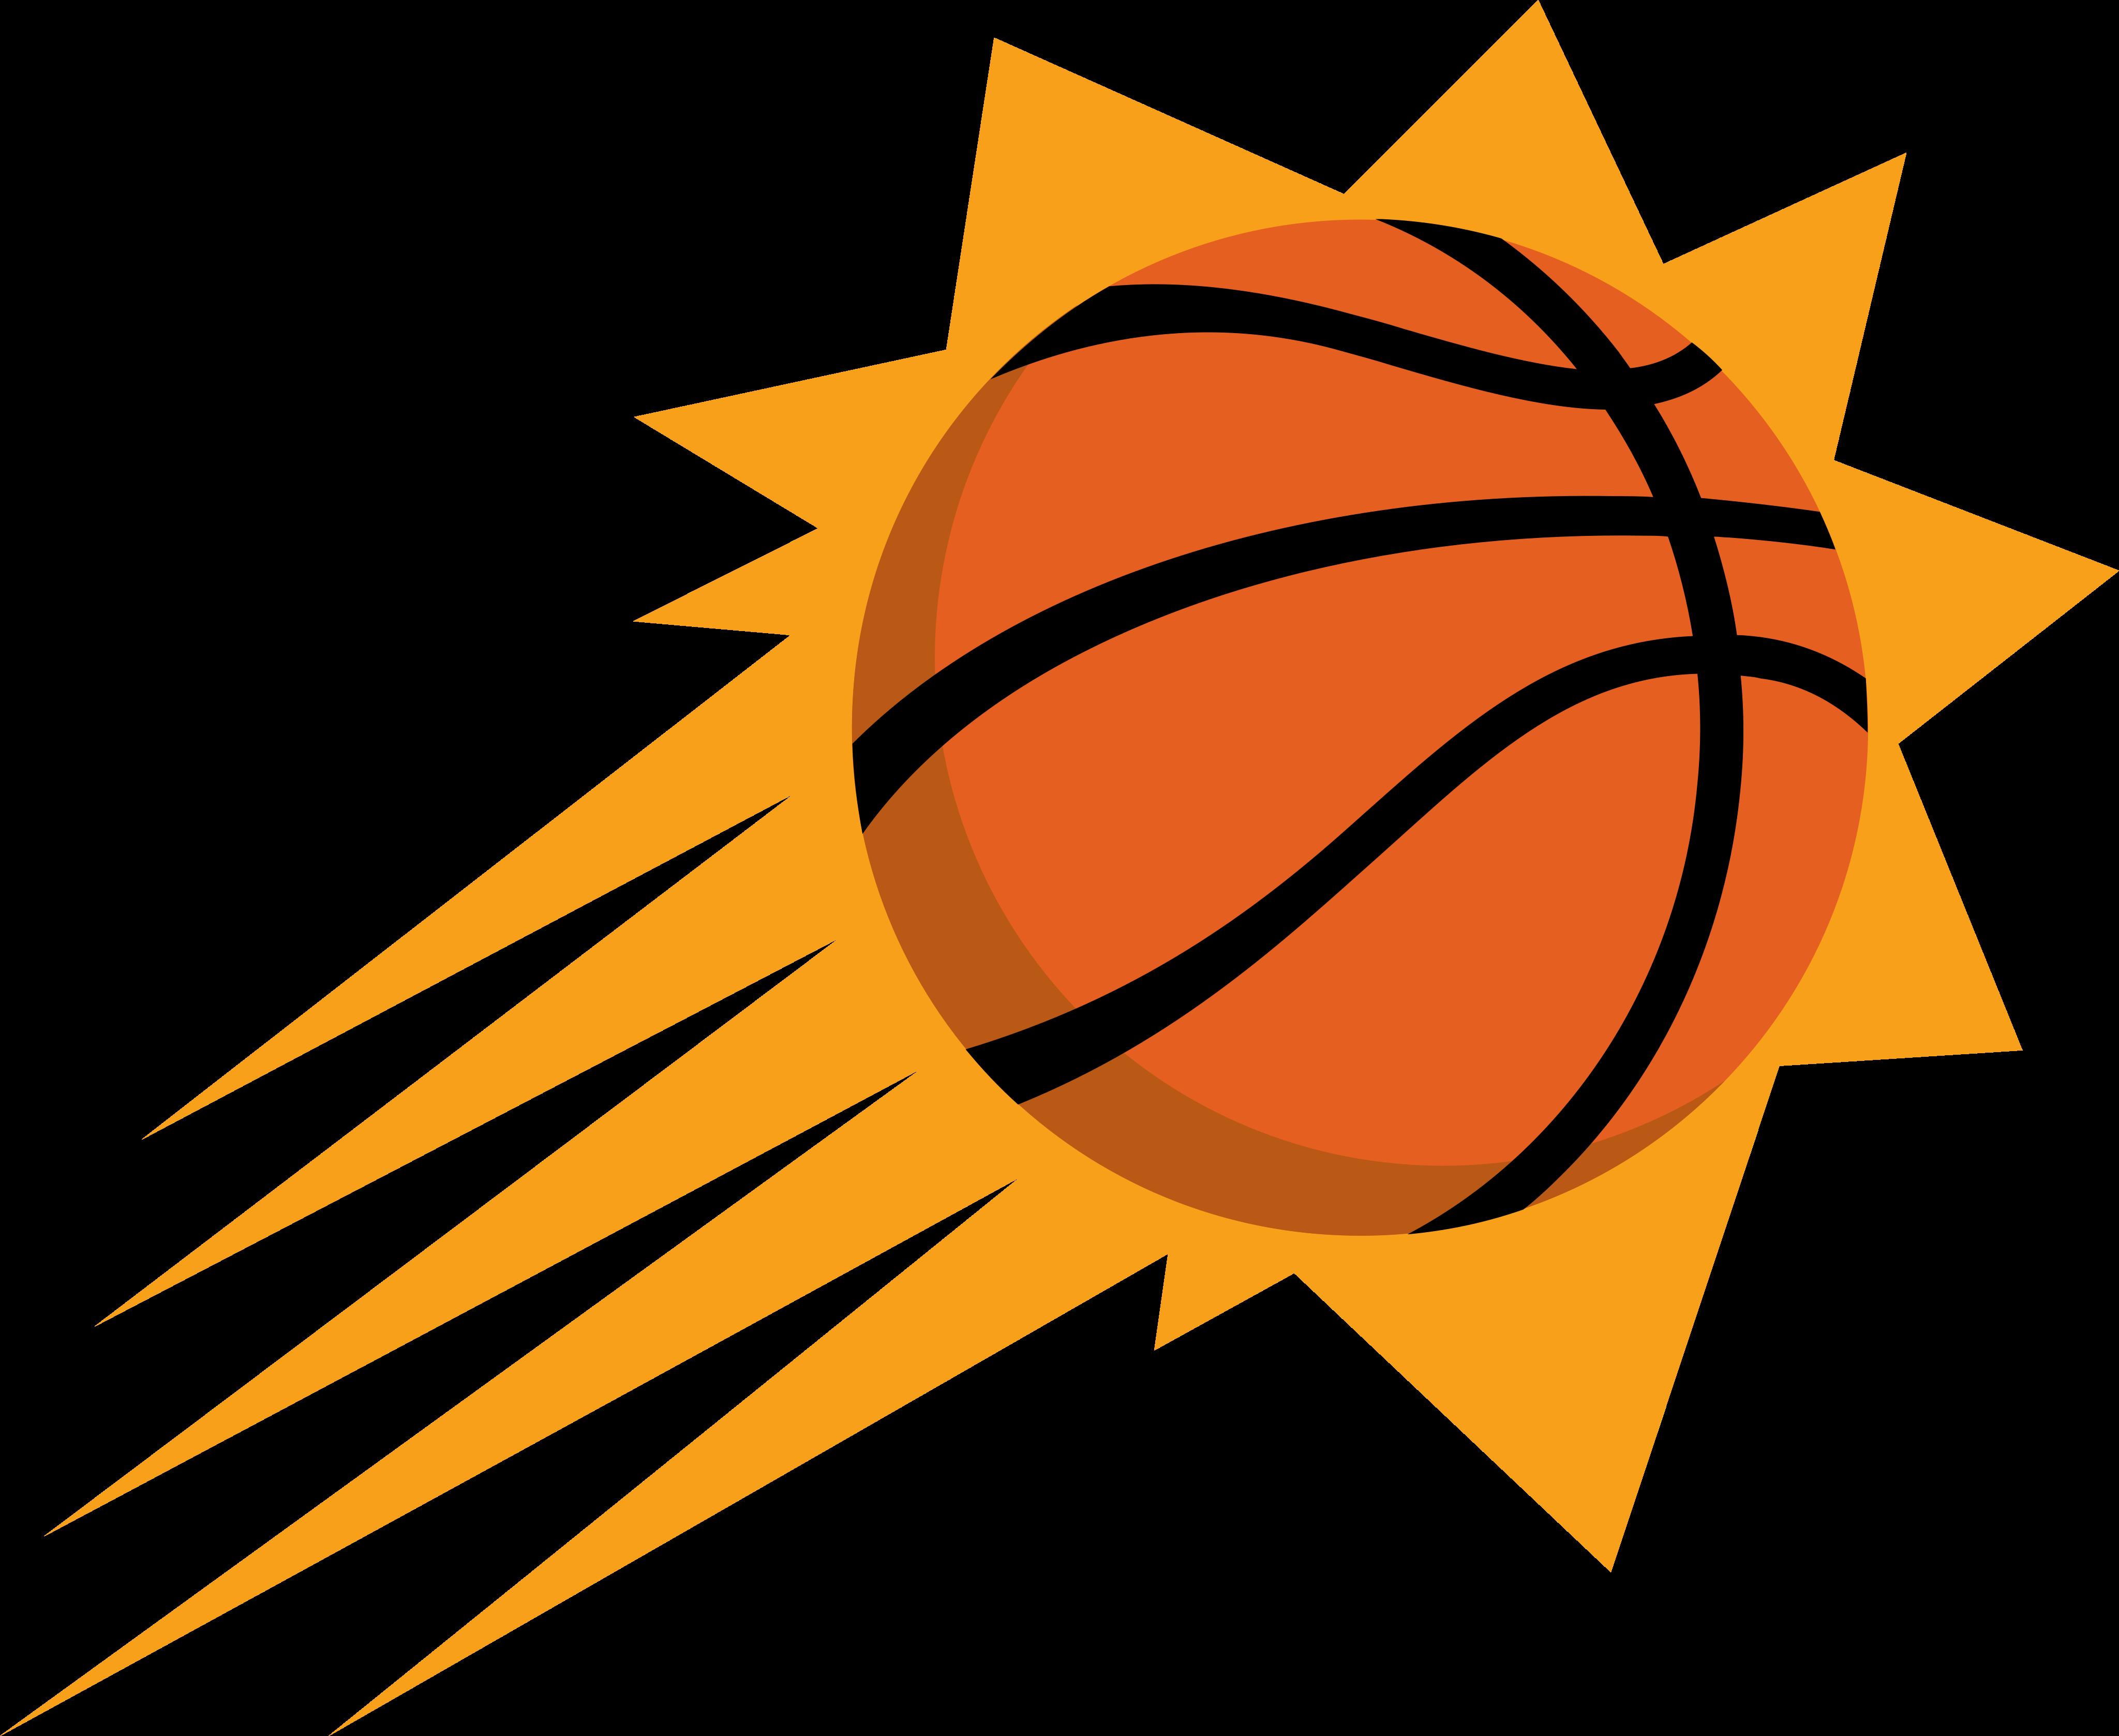 phoenix suns logo 1 - Phoenix Suns Logo